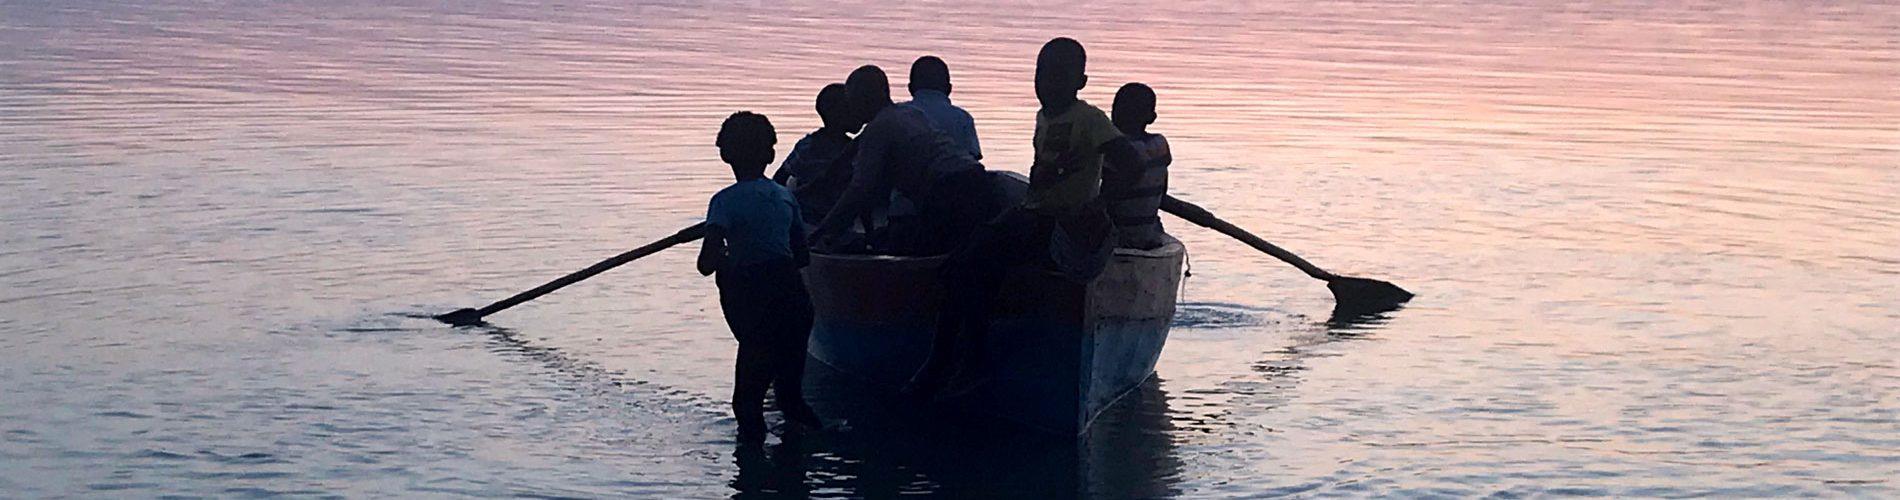 Mozambique boat